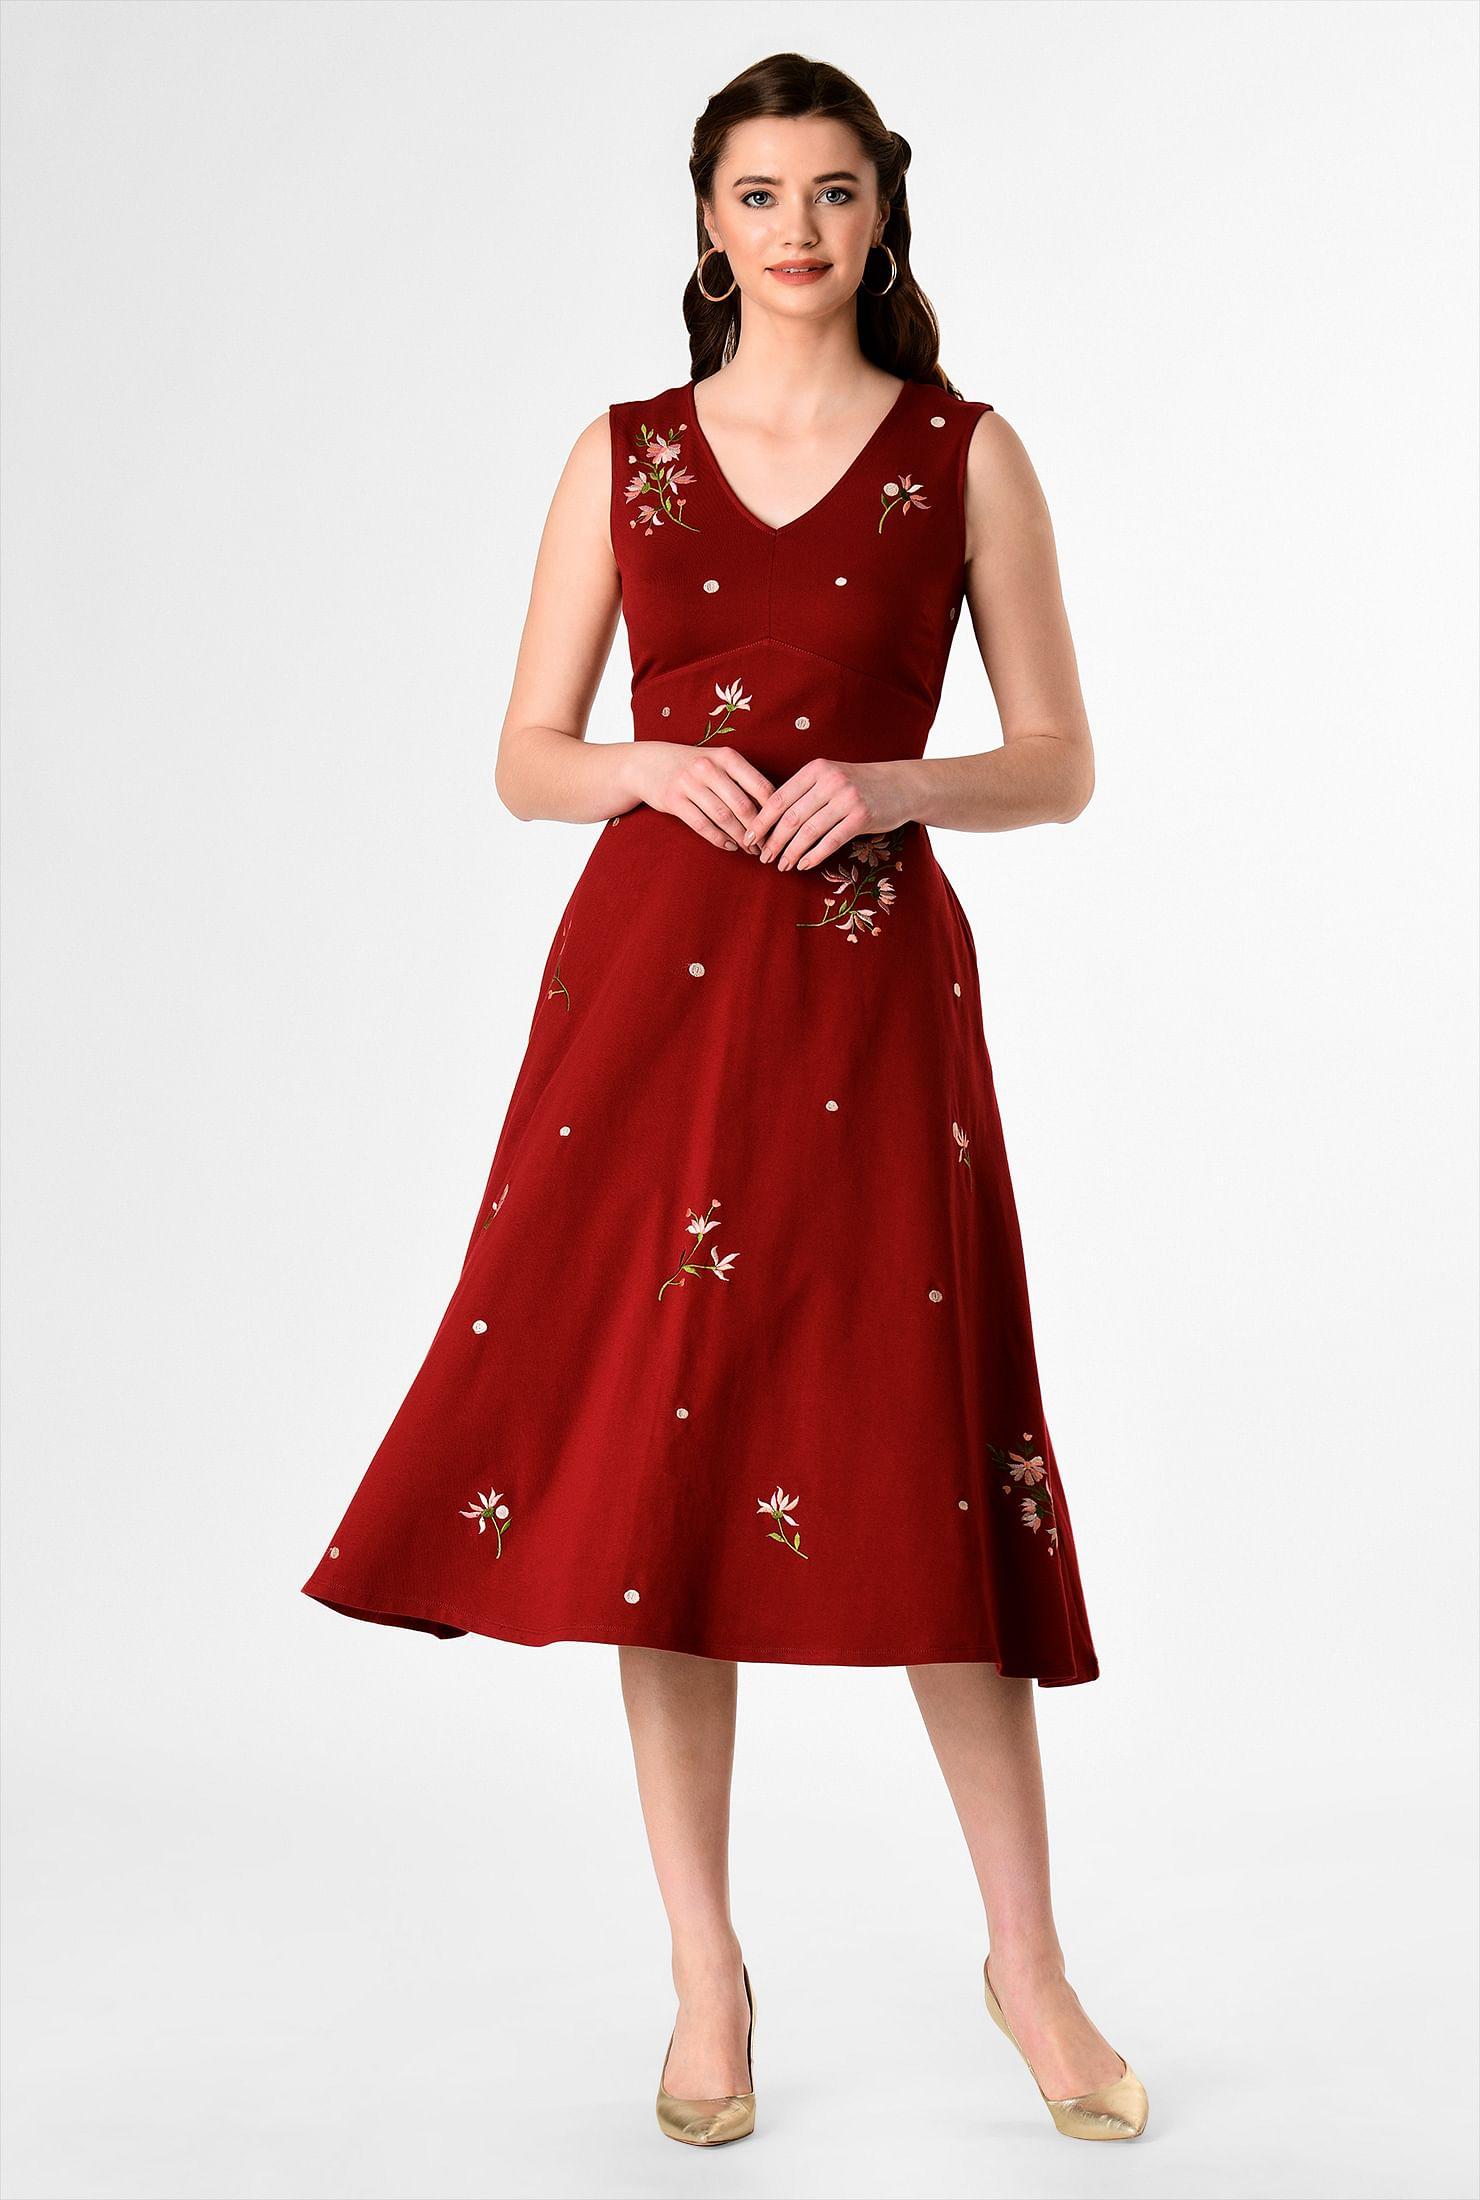 ab3e985e535677 Women's Fashion Clothing 0-36W and Custom